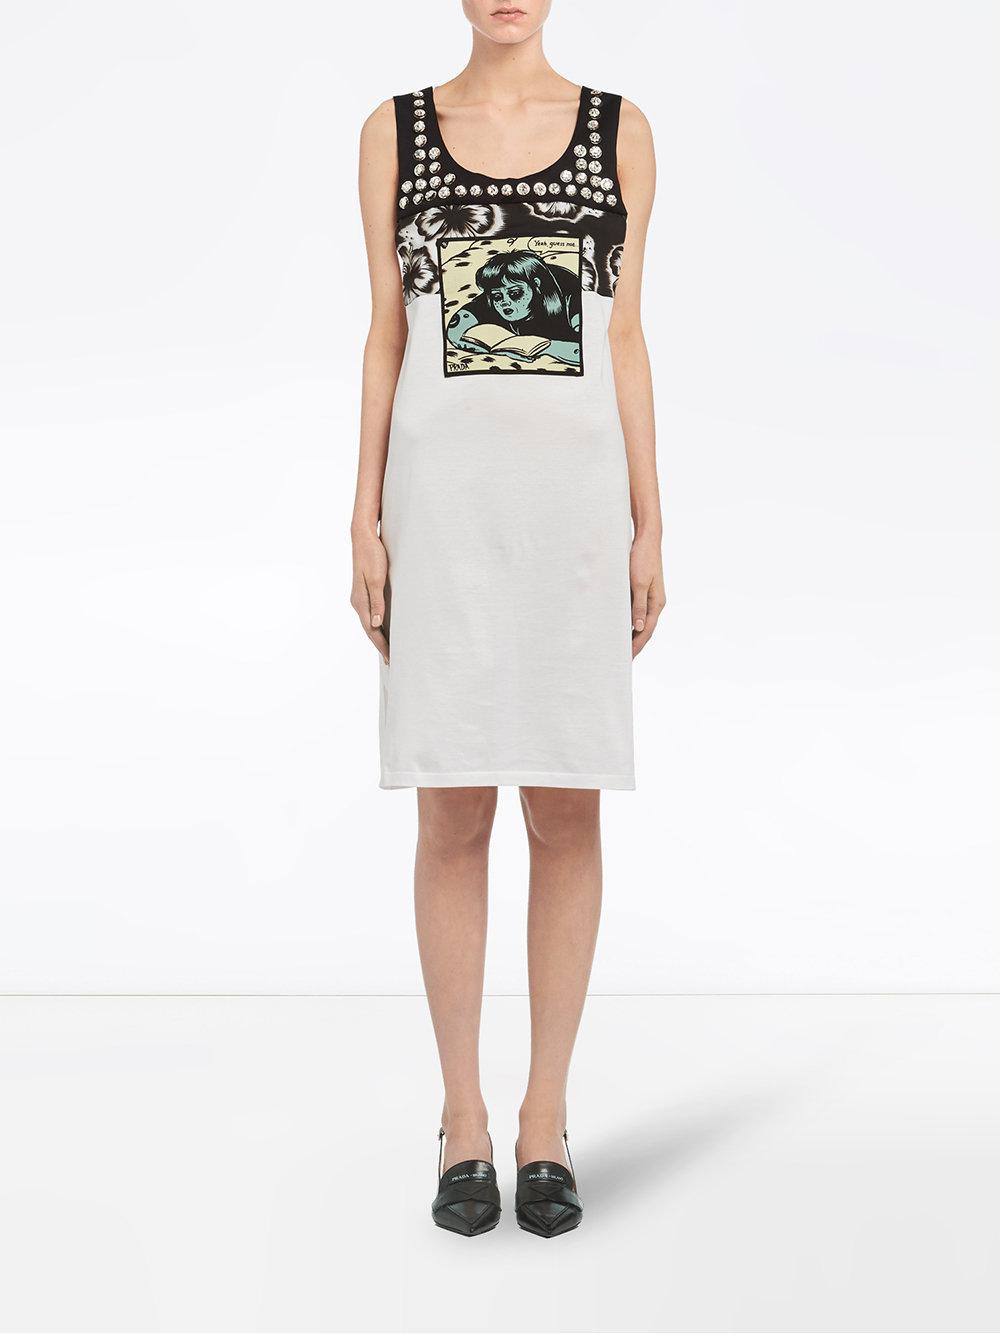 embellished comics print dress - White Prada feHYrojmS5